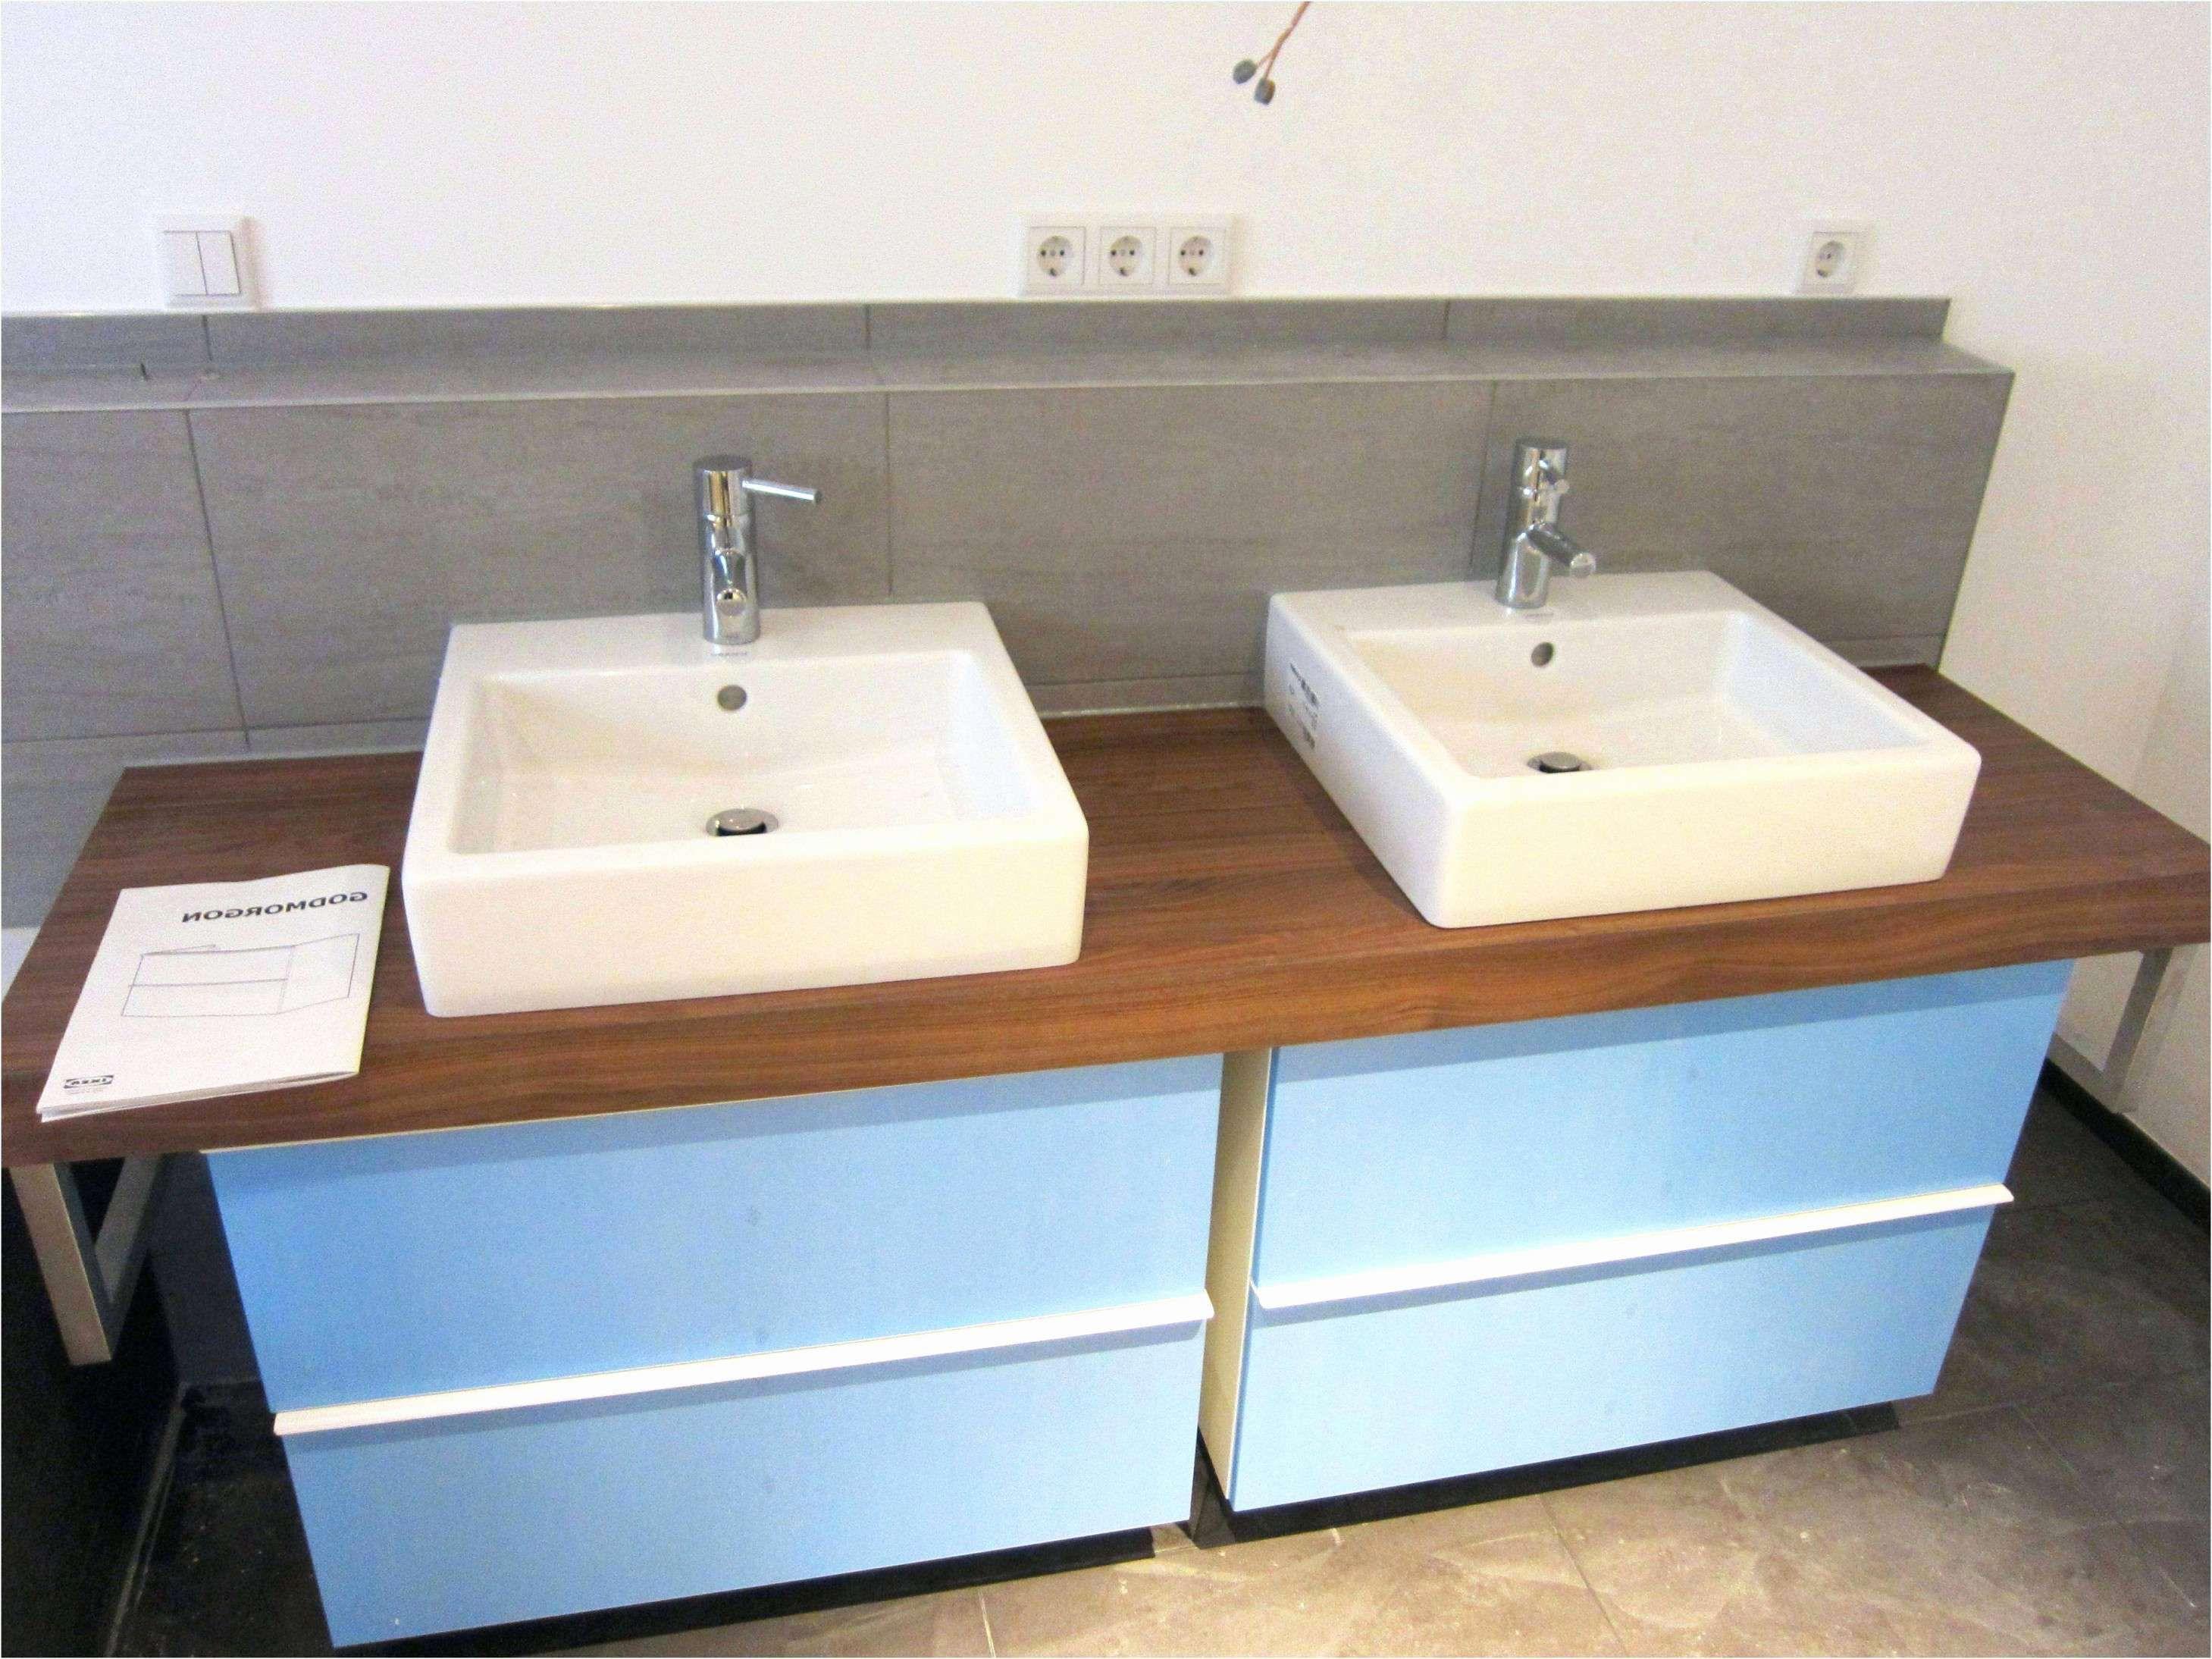 Waschbeckenunterschrank 100 Cm Breit 35 Impressionnant Lavabo 80 Cm In 2020 Bathroom Furniture Vanity Bathroom Vanity Cabinets Ikea Godmorgon